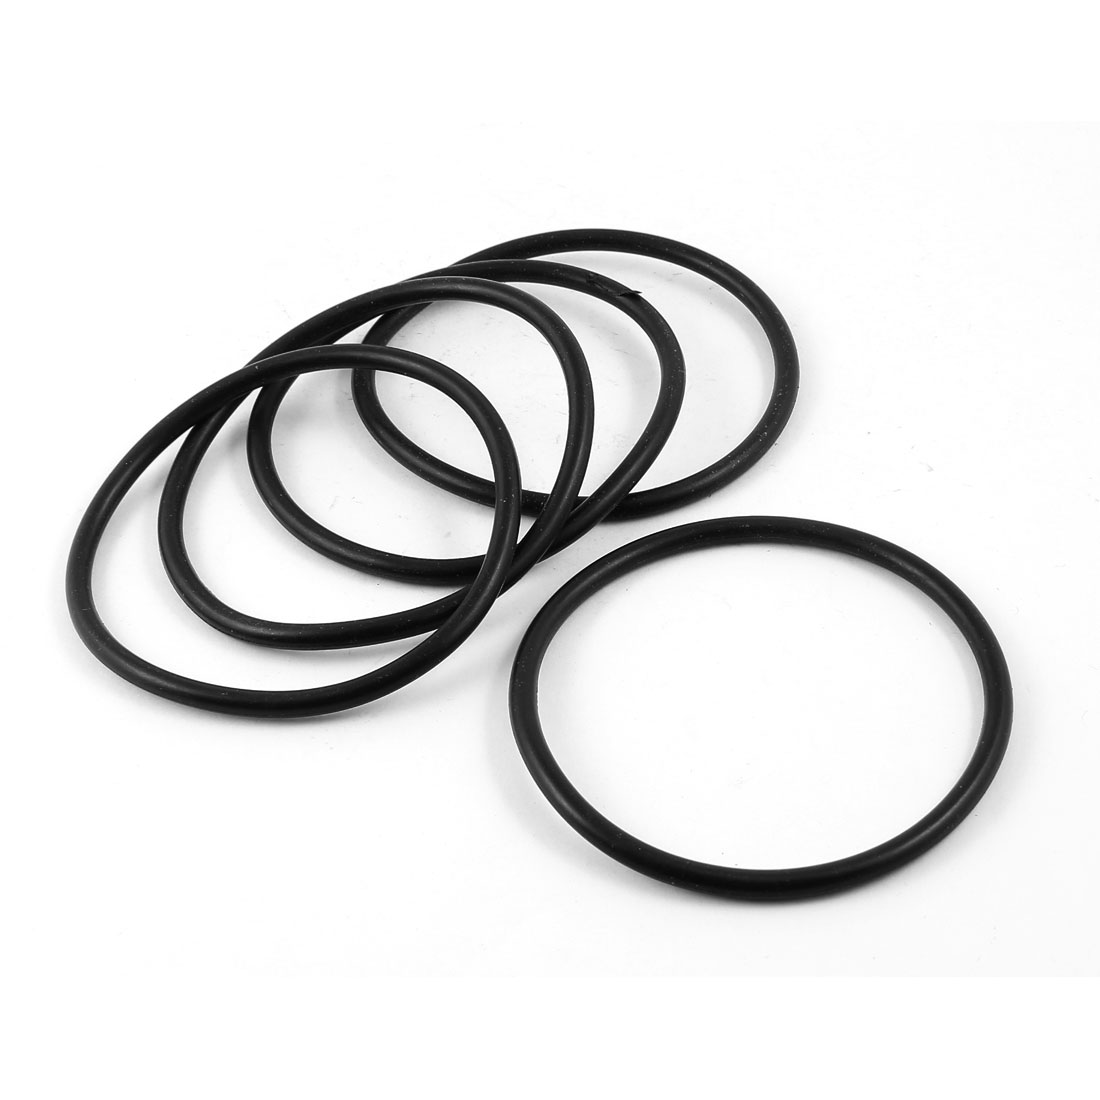 UXCELL 5 piezas 90 Mm X 80 Mm X 5 Mm aceite de goma sellado O anillos para mecánica